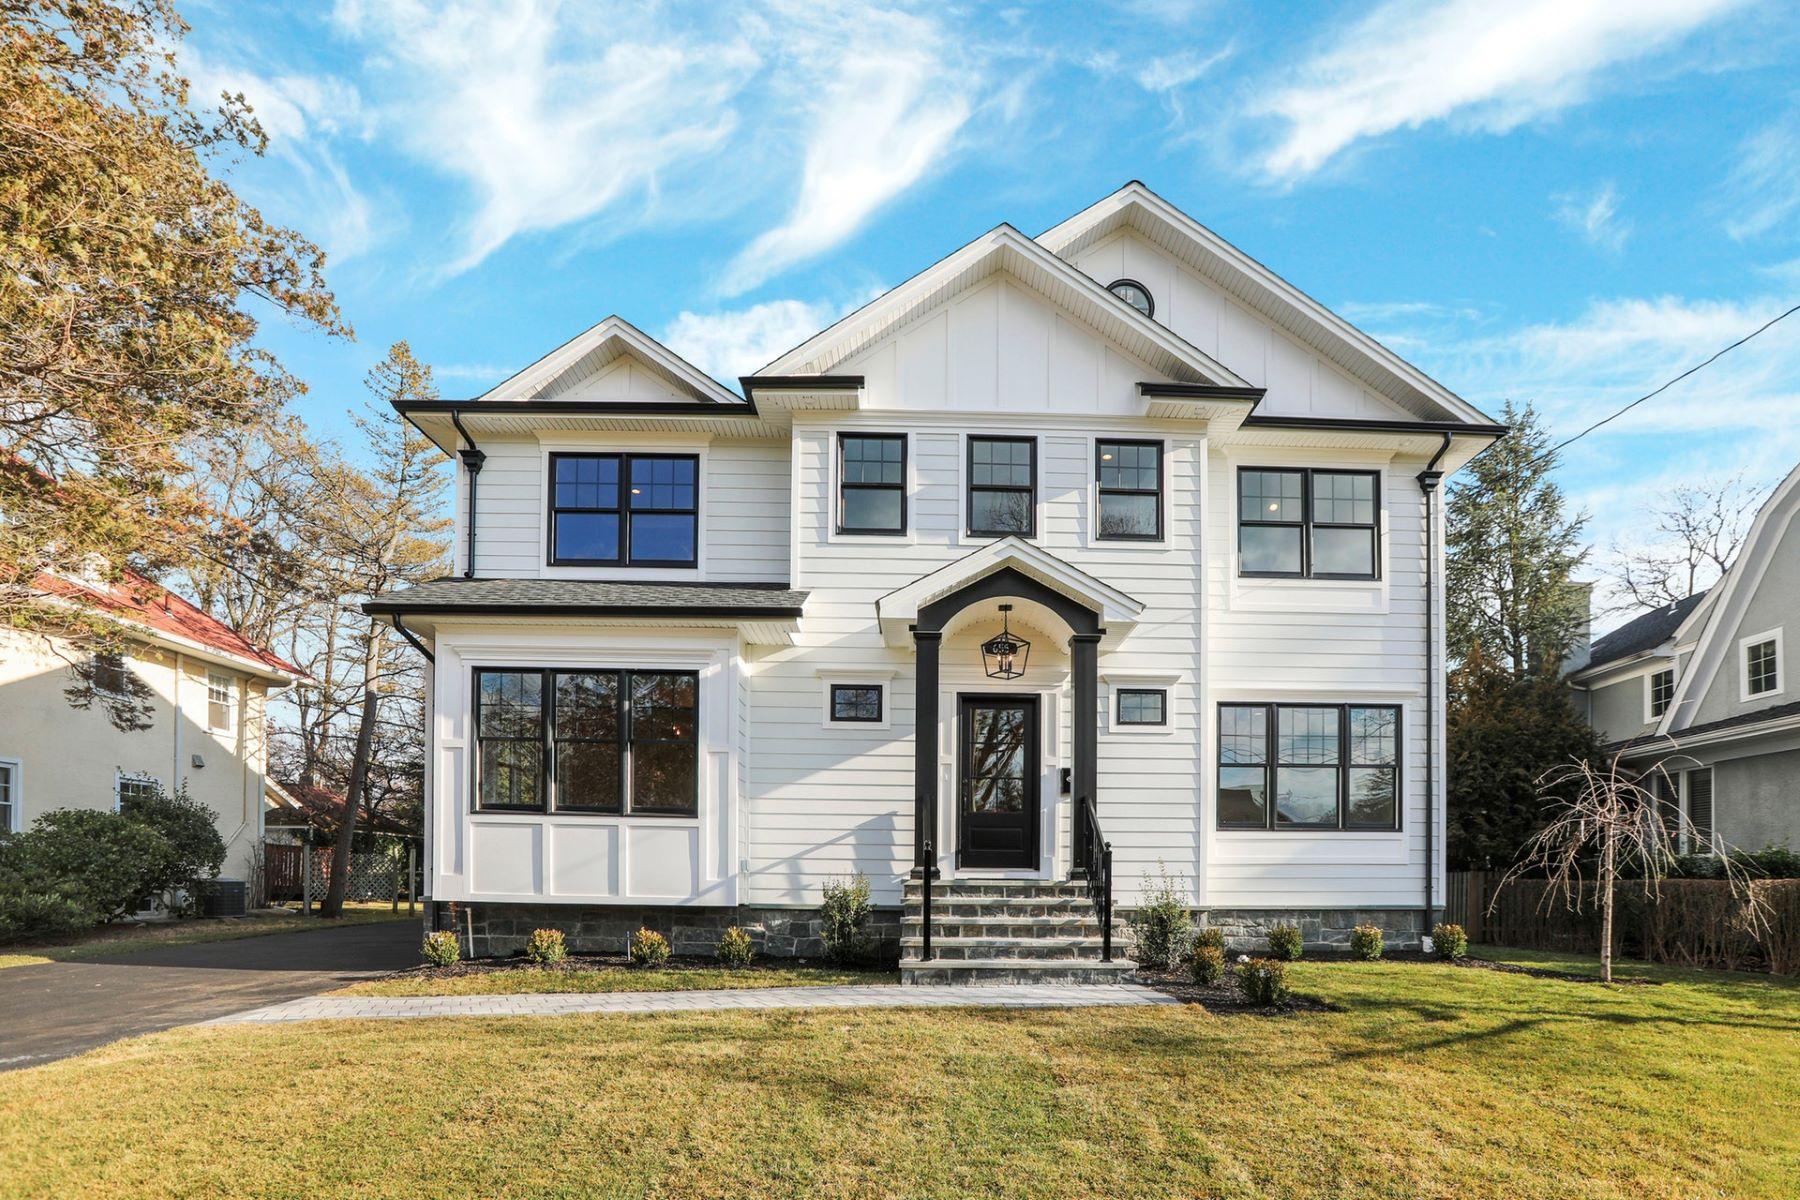 Single Family Homes для того Продажа на Stunning newly constructed 4,400 sqft 6 bedroom, 5 ½ bathroom custom Home 655 Doremus Ave, Glen Rock, Нью-Джерси 07452 Соединенные Штаты